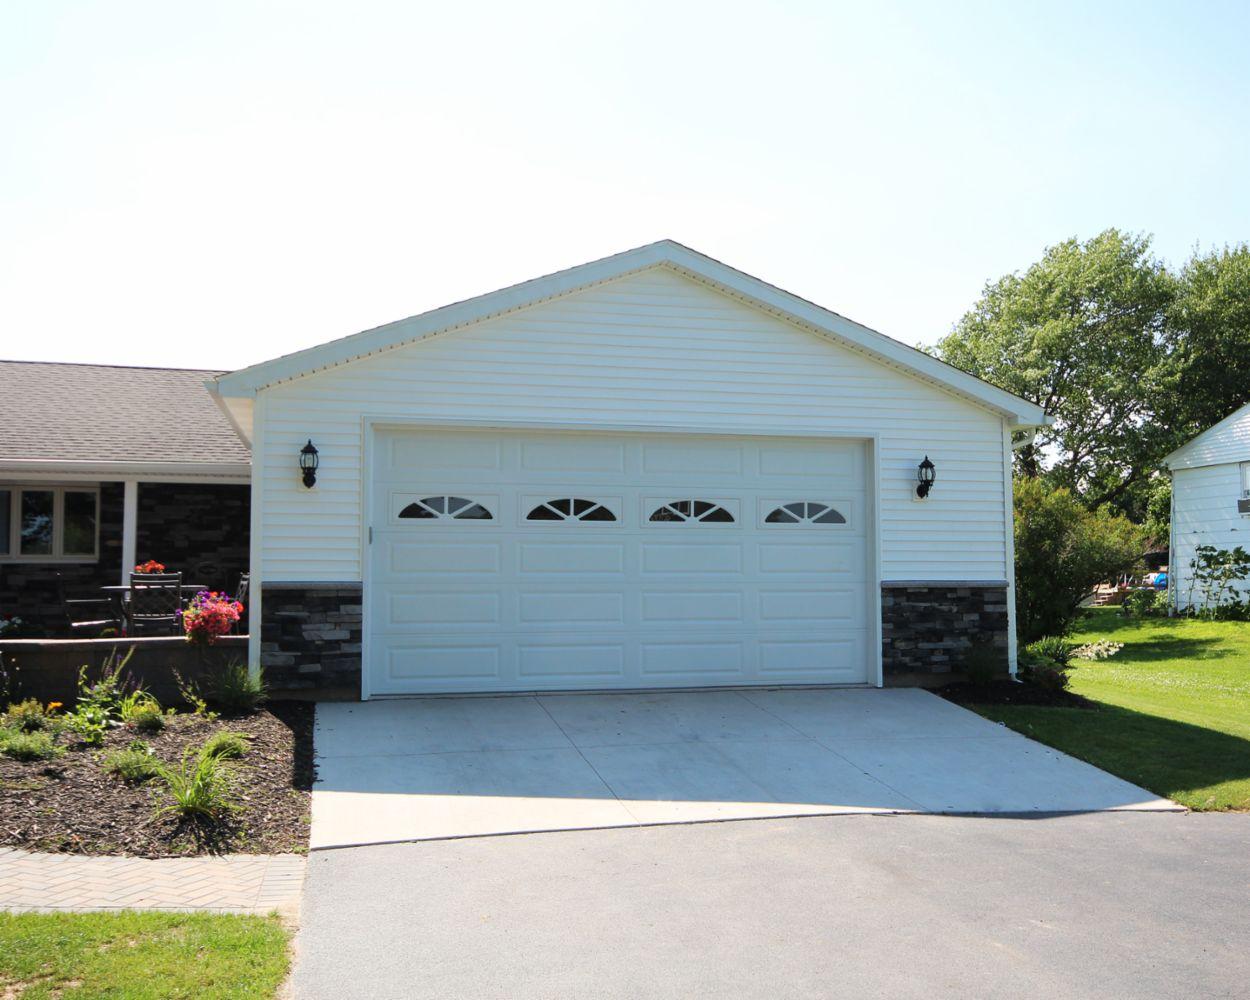 Garage Door Repair Amp Installation In Westlake Village Ca